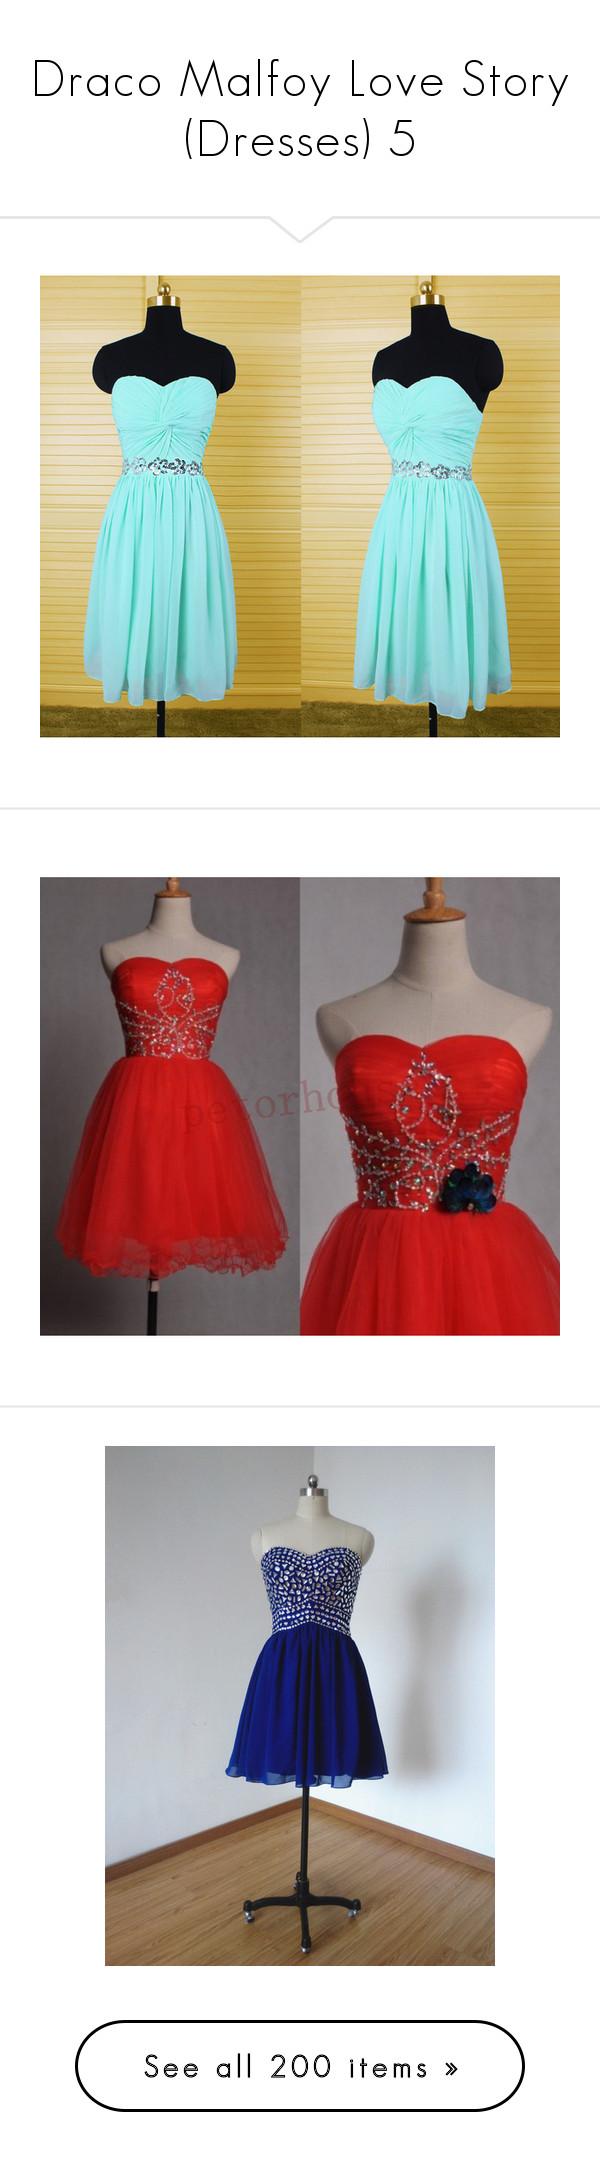 Draco malfoy love story dresses